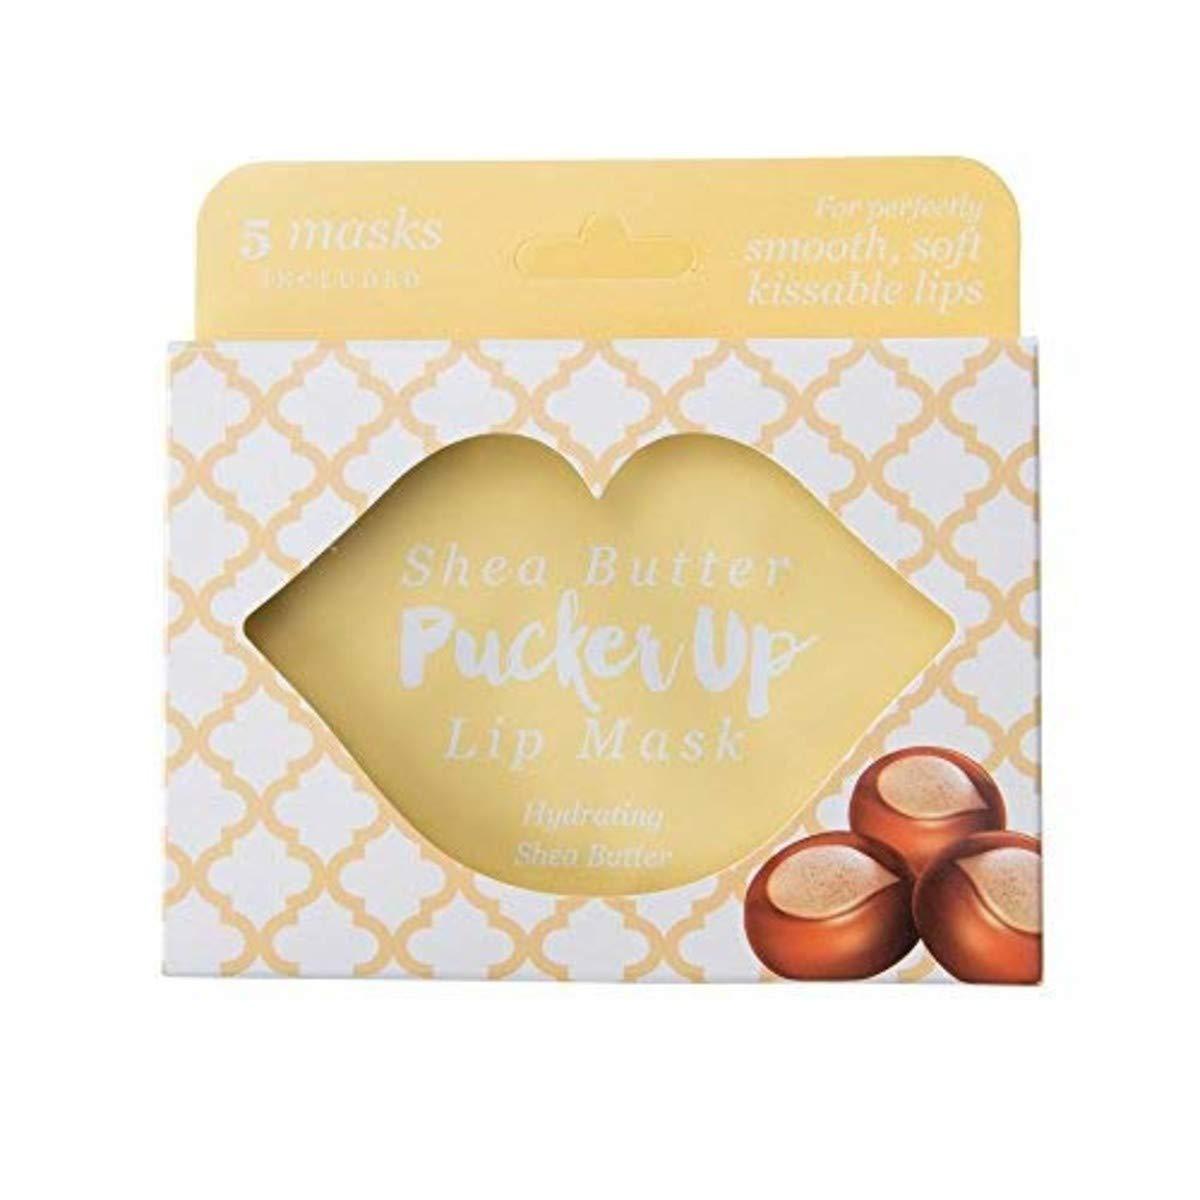 Pucker Up, Lip Mask, Skin Care, Balms & Moisturizers - Set of 5, Shea Butter